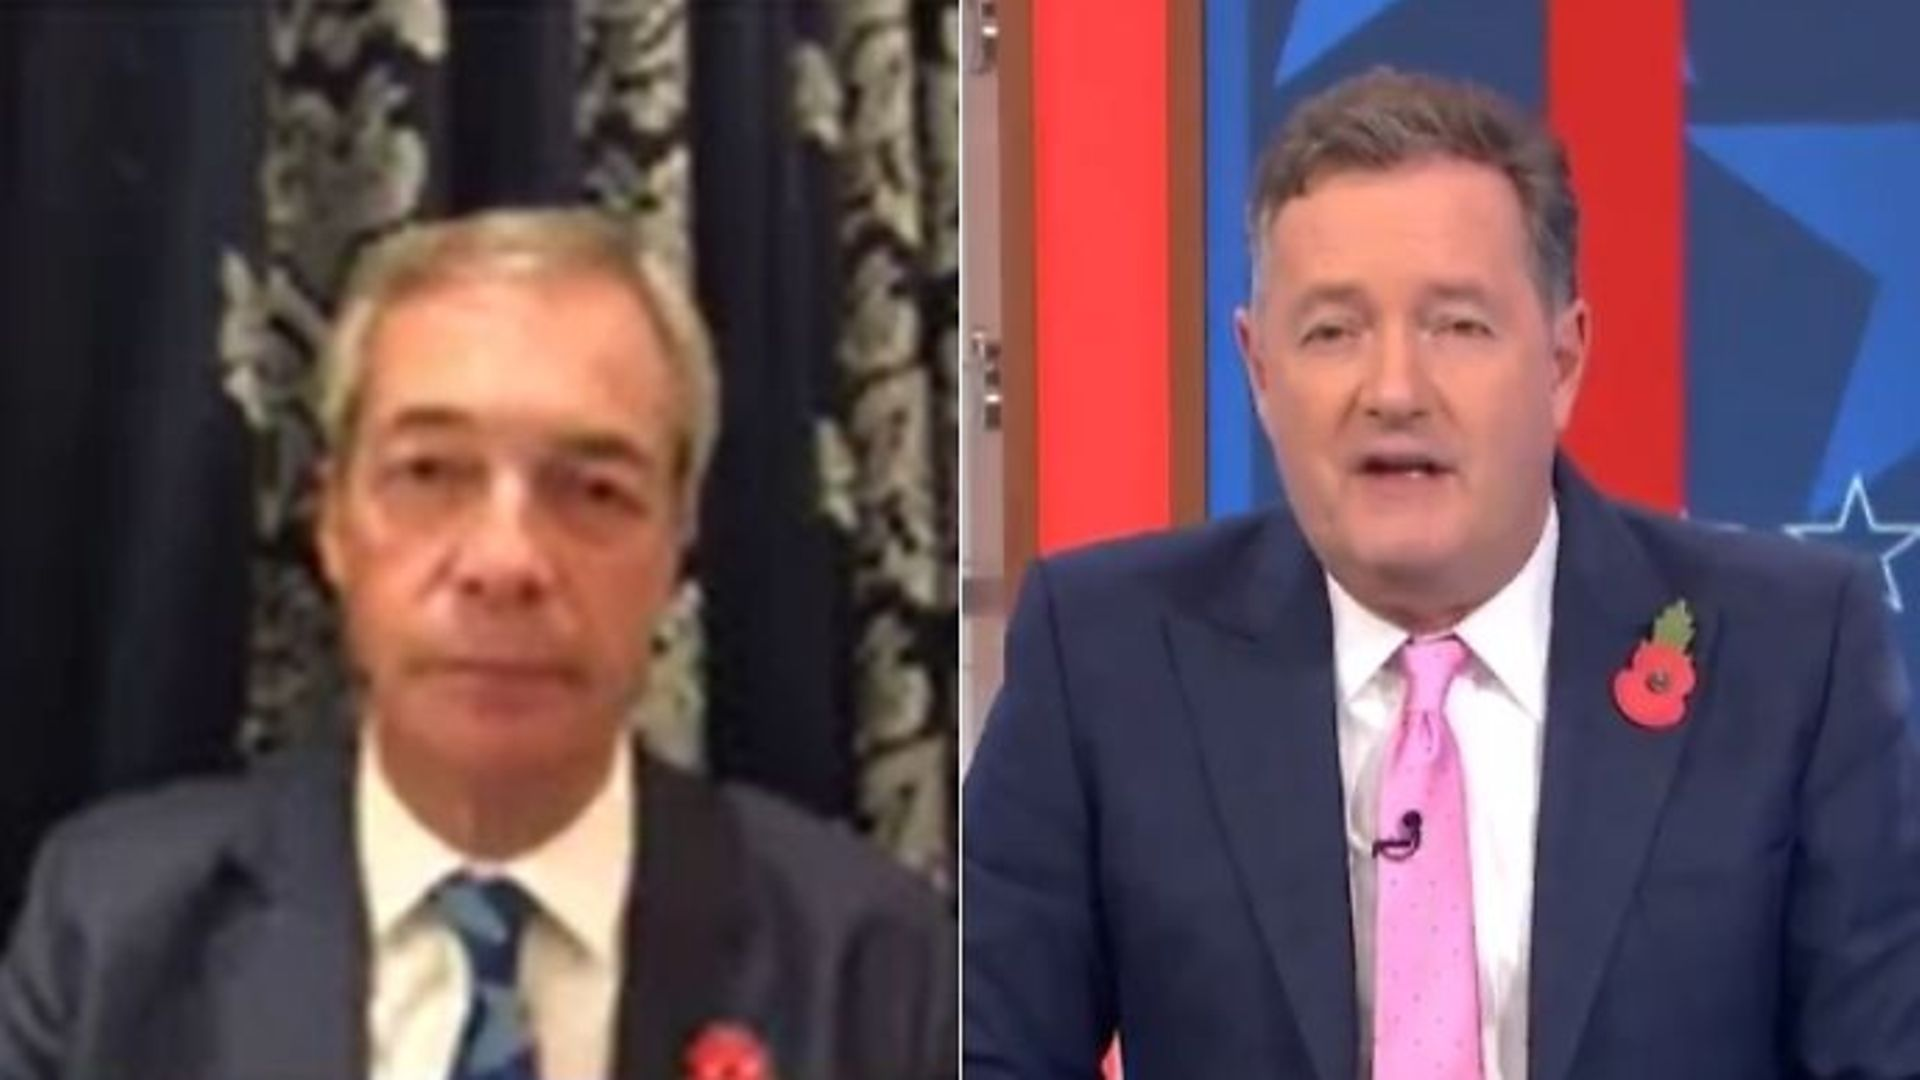 Nigel Farage (L) and Piers Morgan on Good Morning Britain - Credit: Twitter